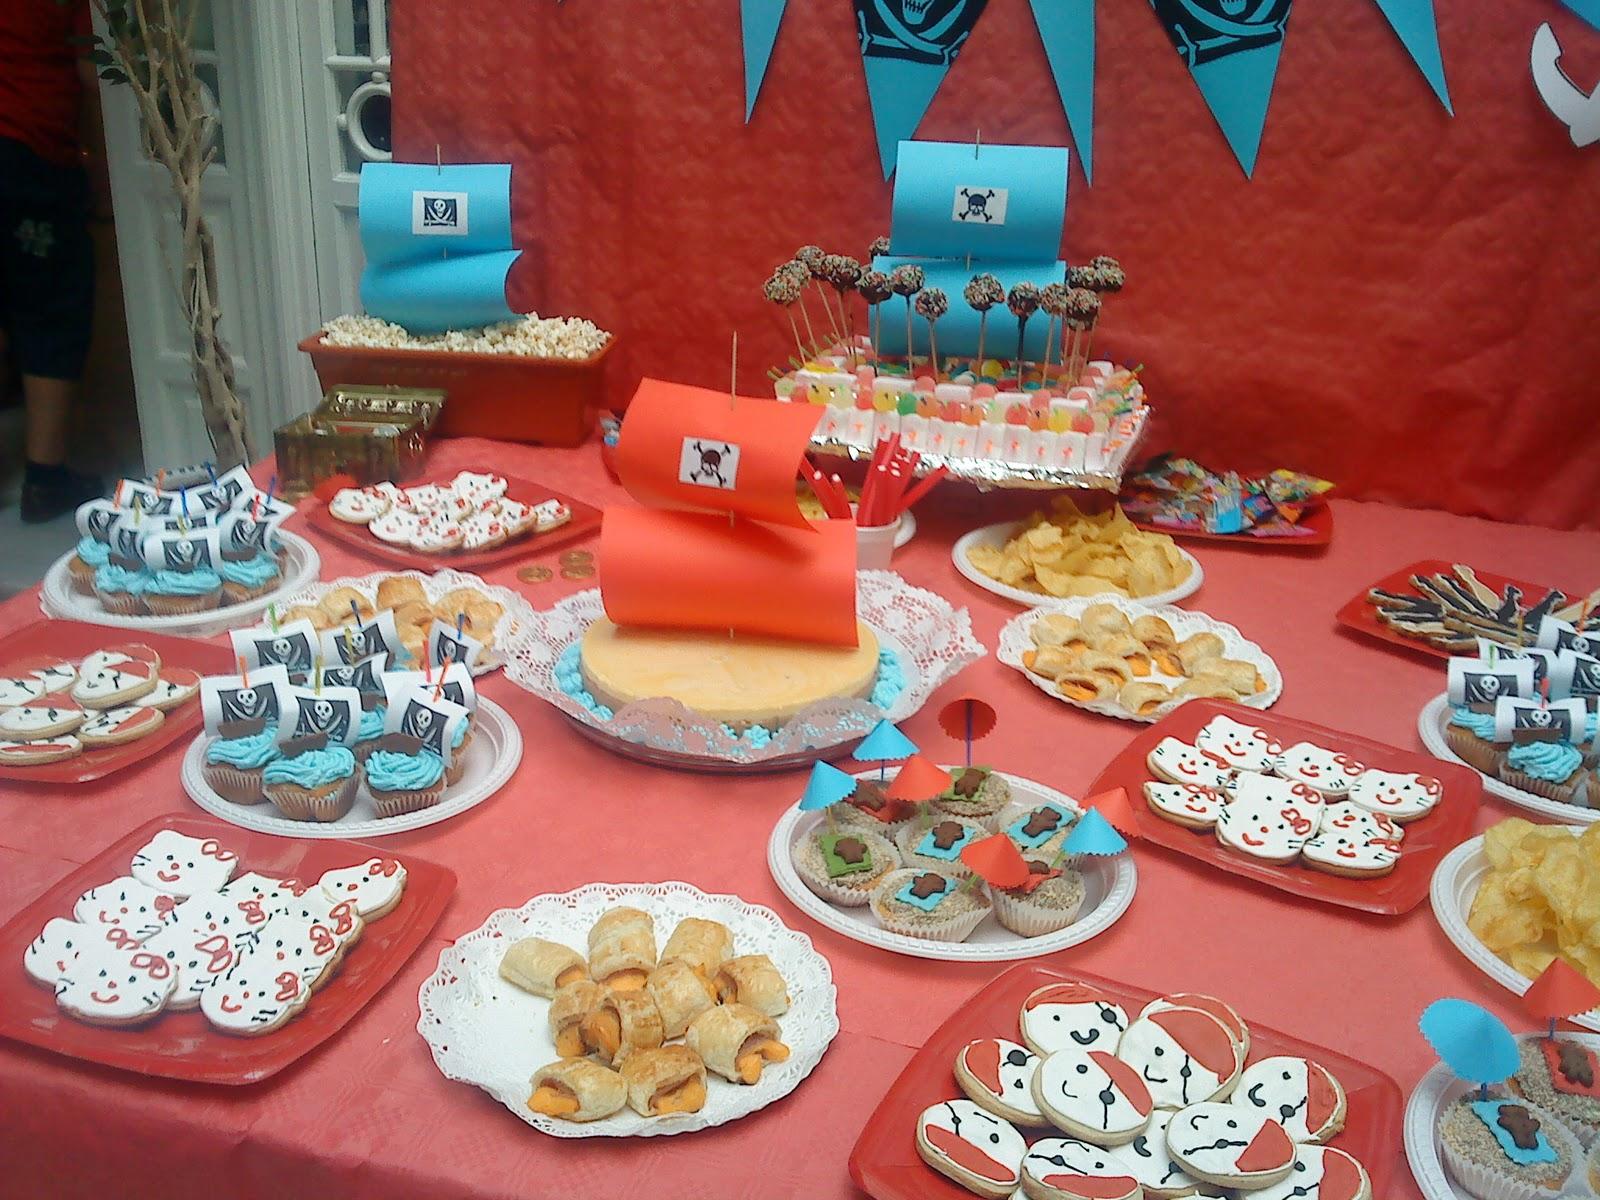 Chocolate y burbujas fiesta cumplea os piratas - Preparar fiesta cumpleanos ...